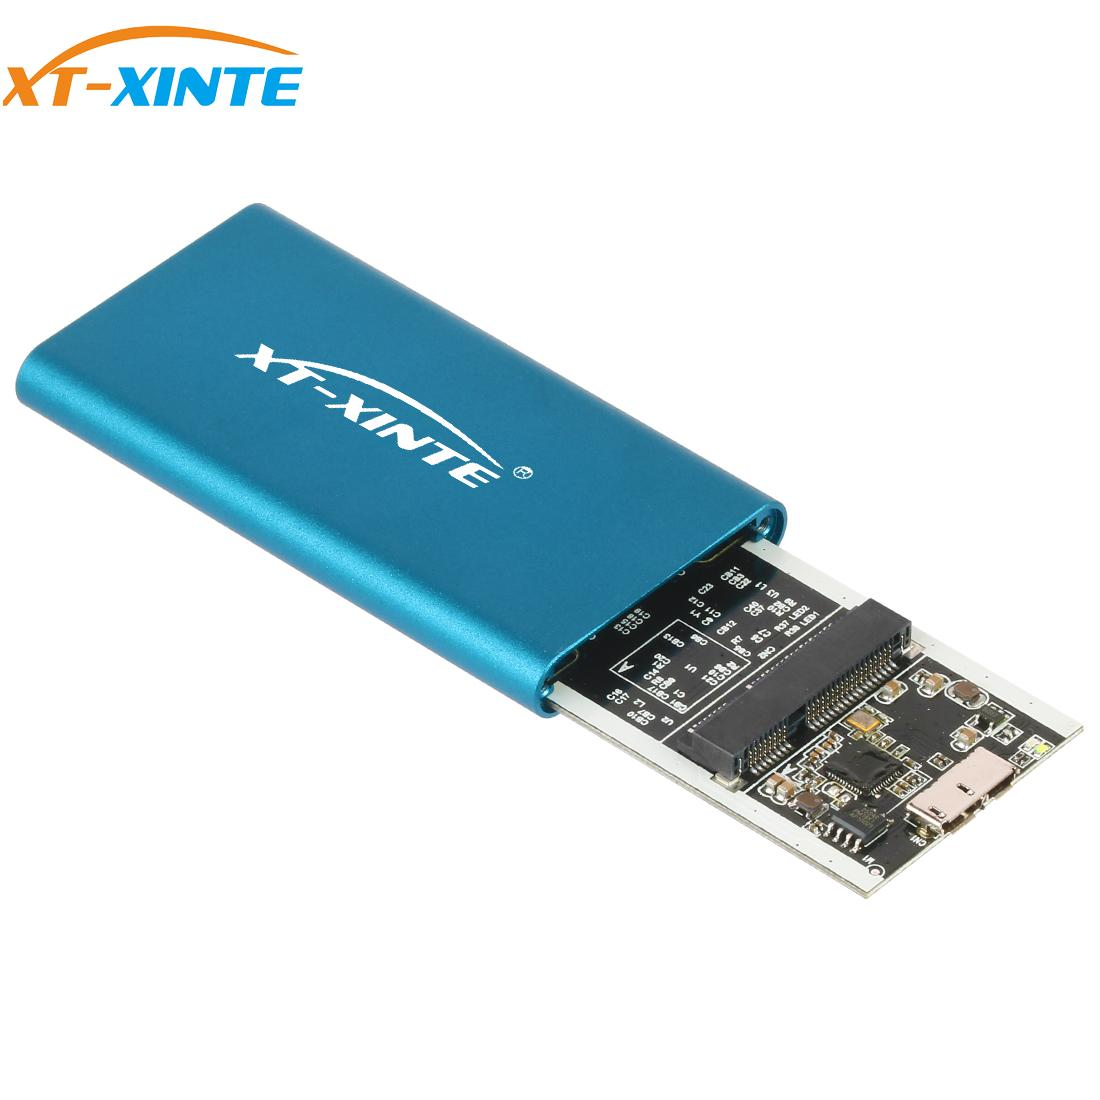 XT-XINTE External Enclosure Hard Drive Mini MSATA To USB 3.0 HDD Hard Drive Adapter Case For MSATA SSD Case Box